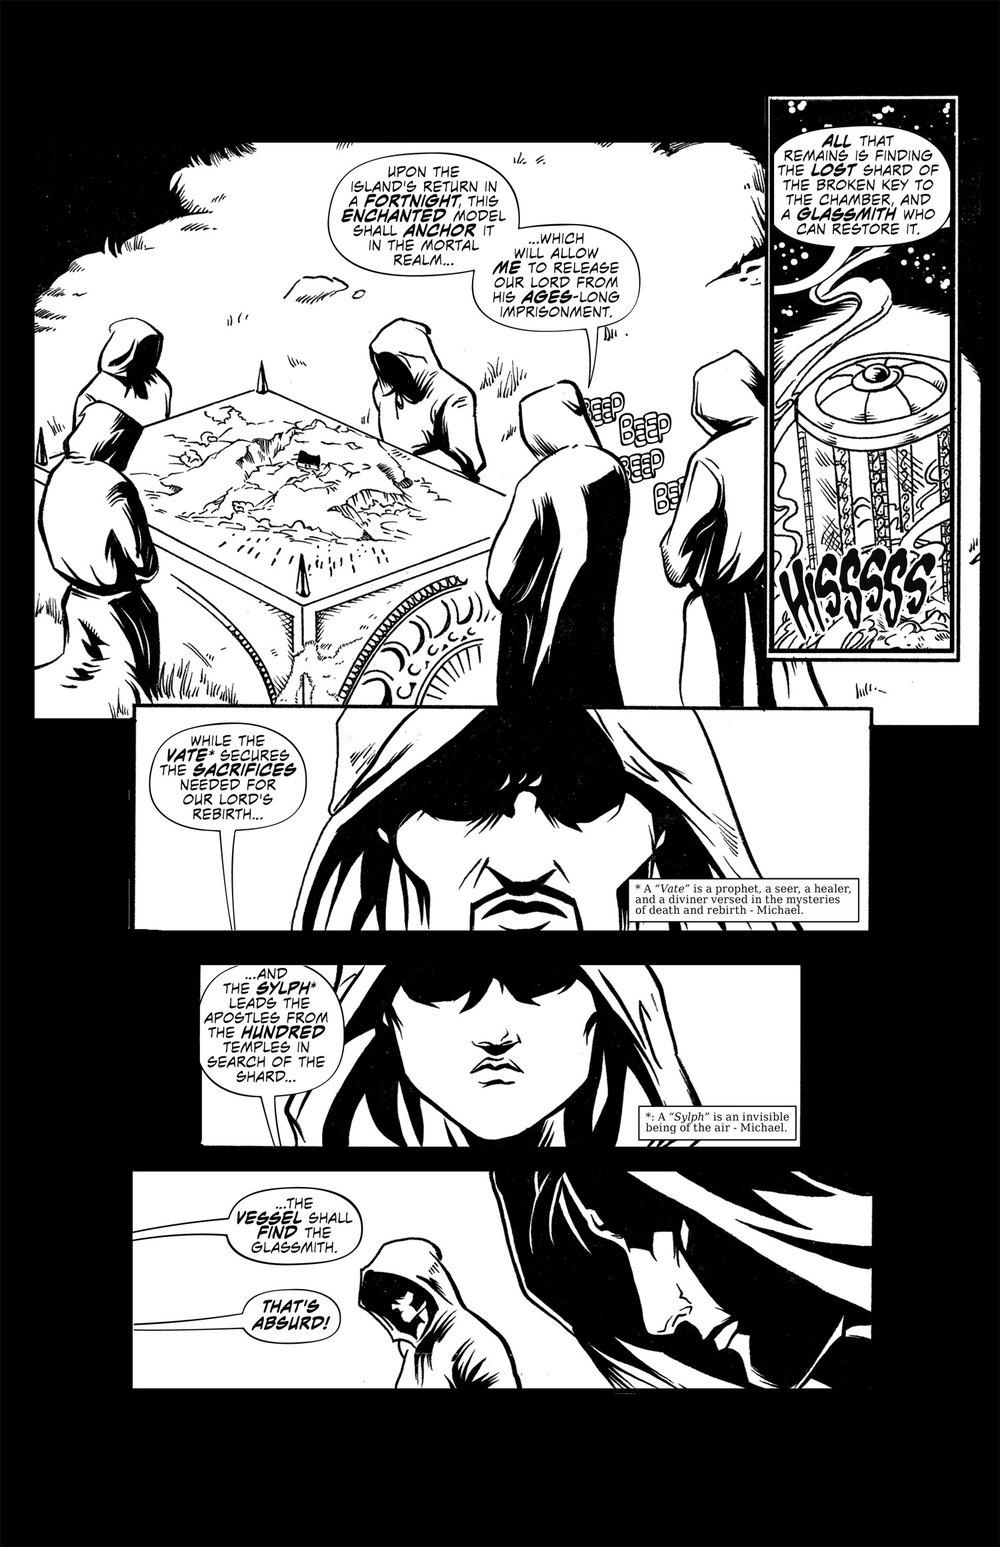 KNIGHTS-LEGACY-AWAKENING-01-ltrd-page-04.jpg